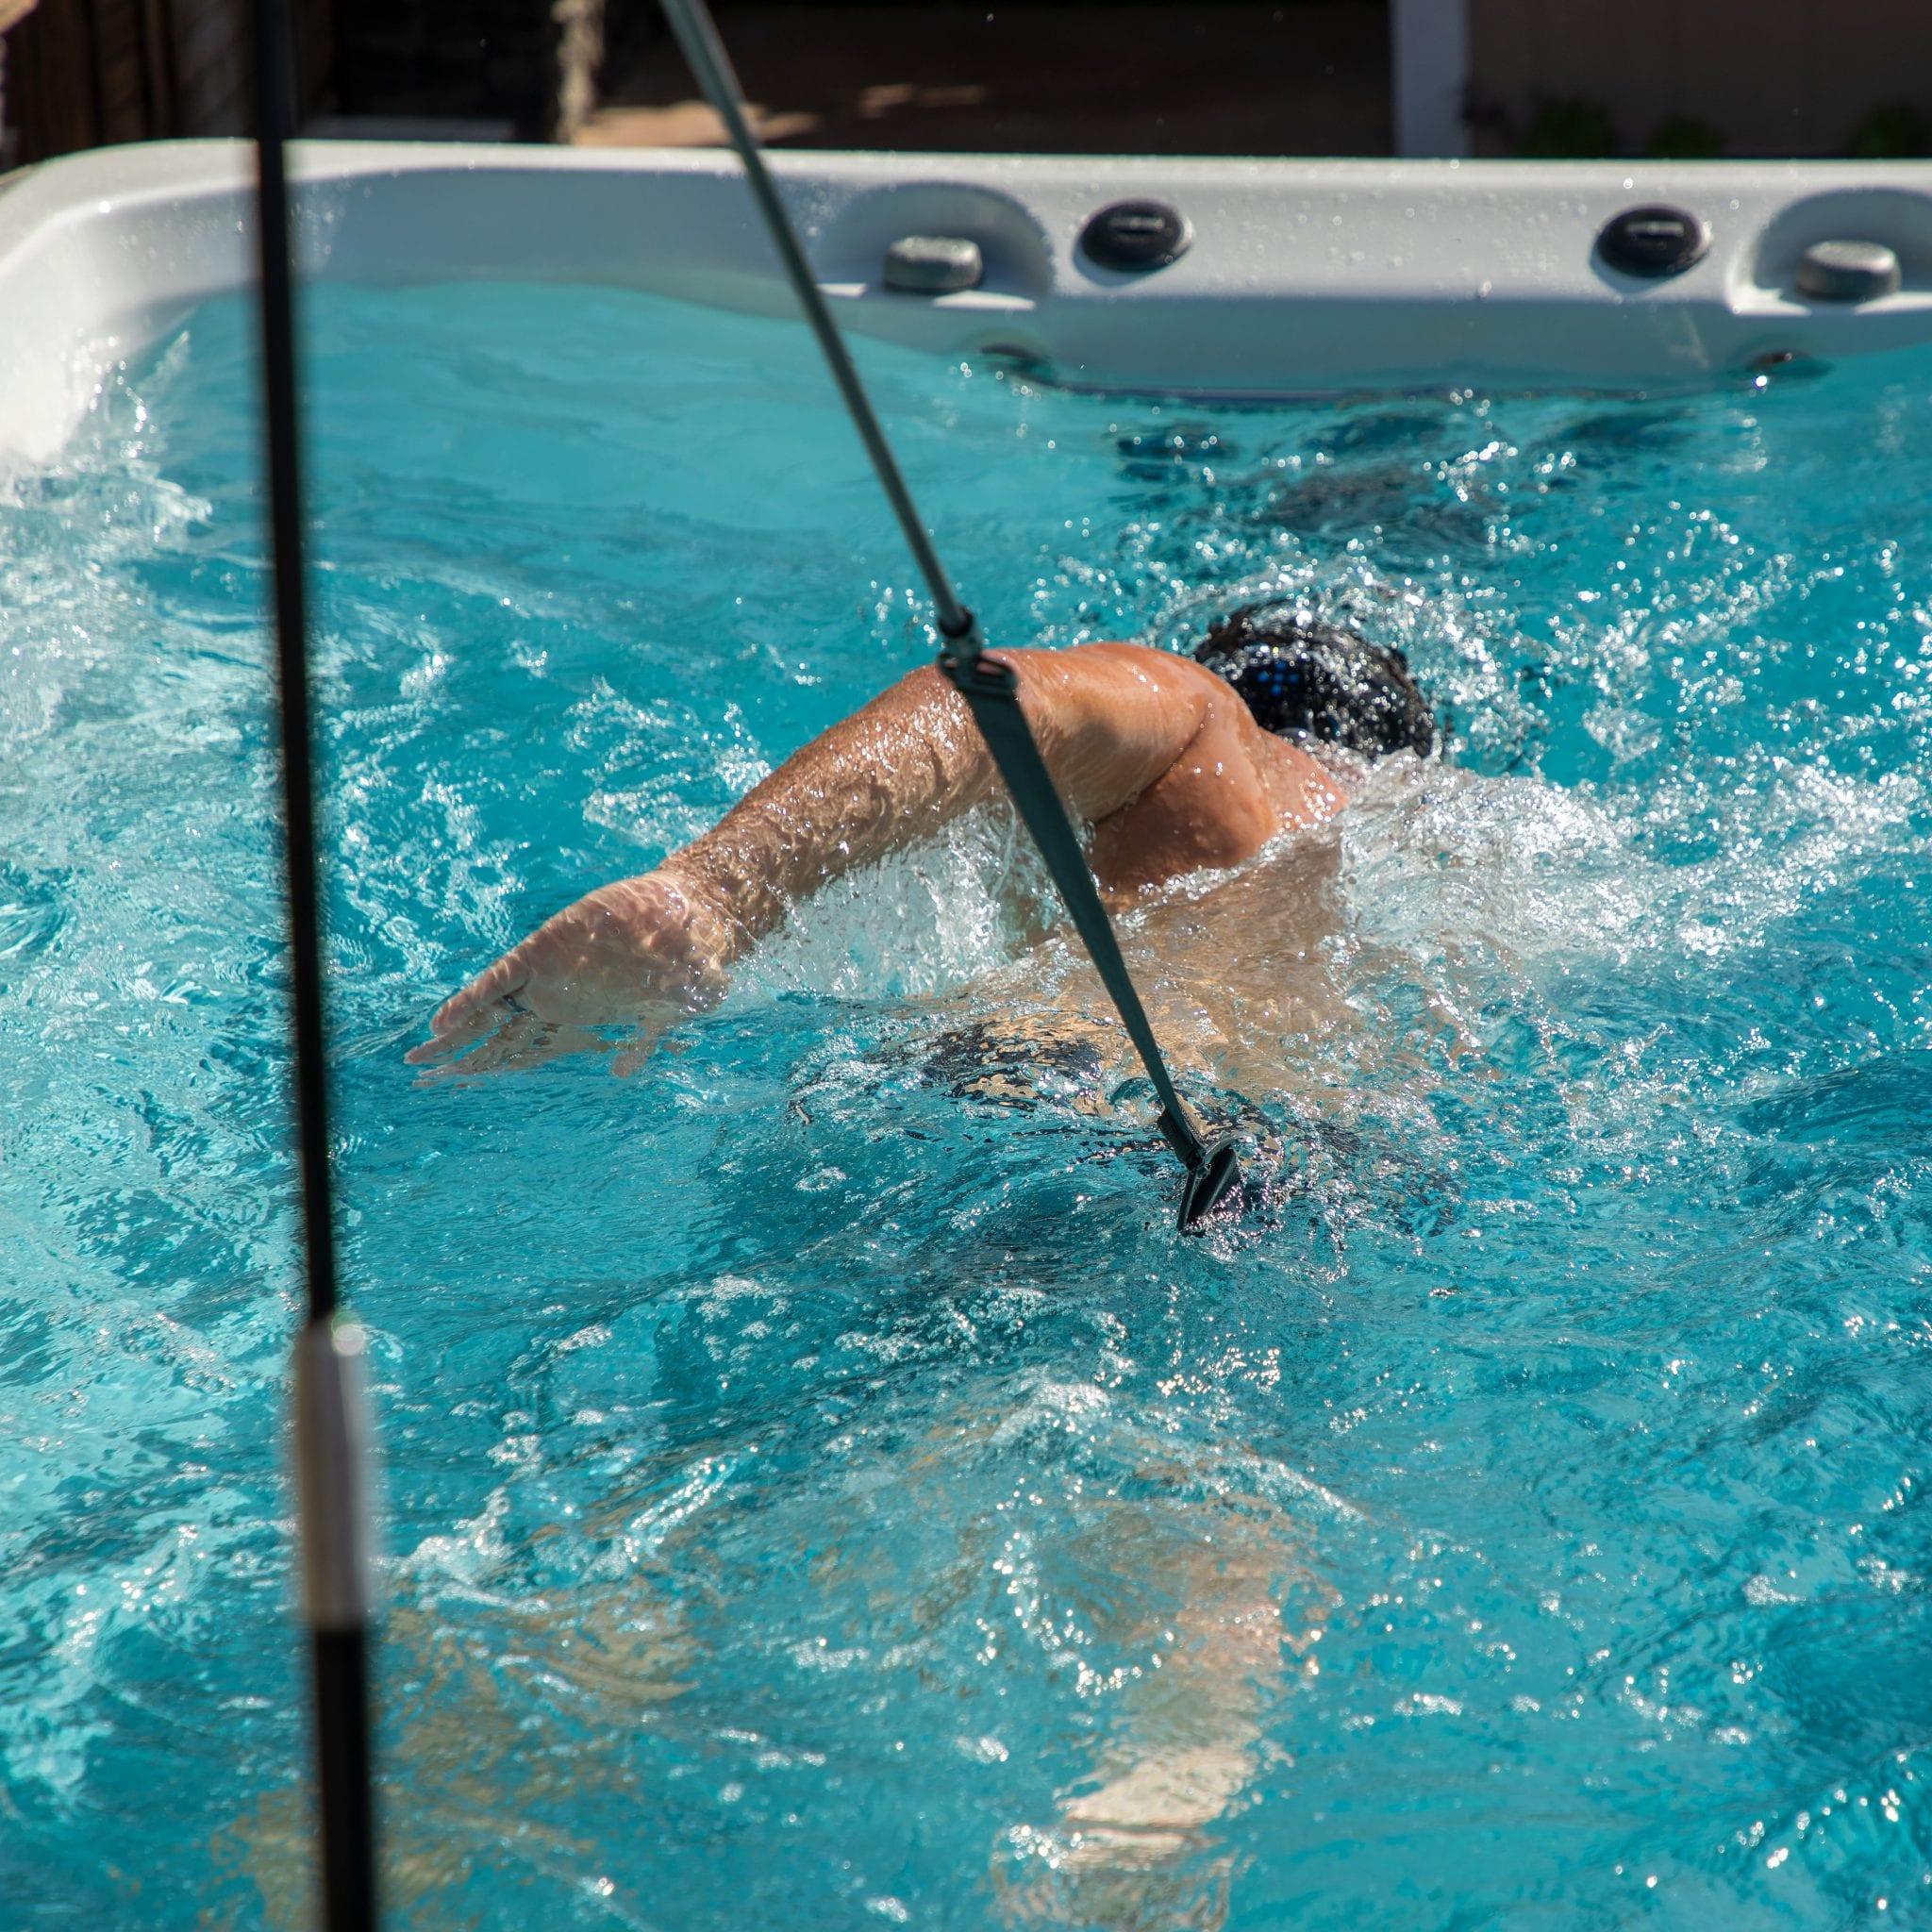 Endless Pools SwimCross 2020 X500 Alpine White Gray lifestyle image